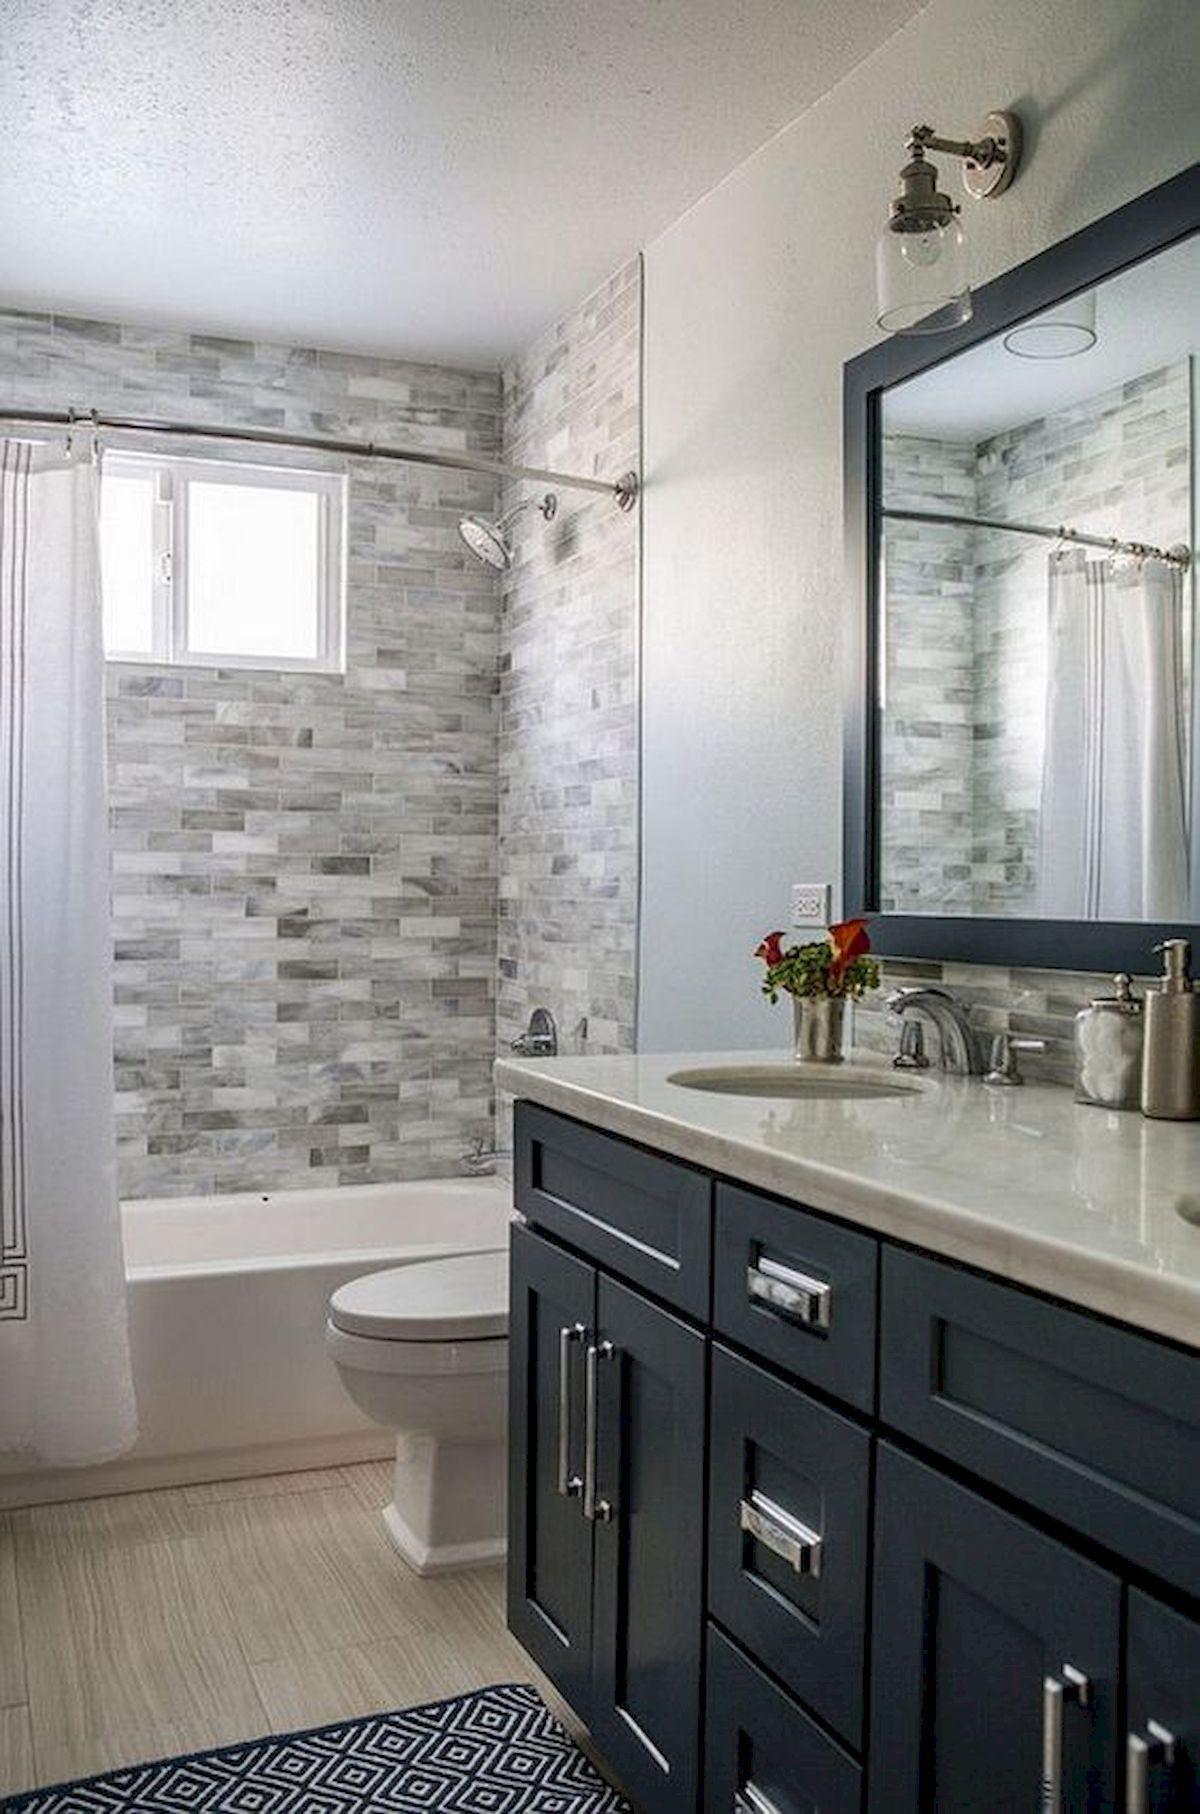 60 Elegant Small Master Bathroom Remodel Ideas 42 Small Bathroom Remodel Small Bathroom Decor